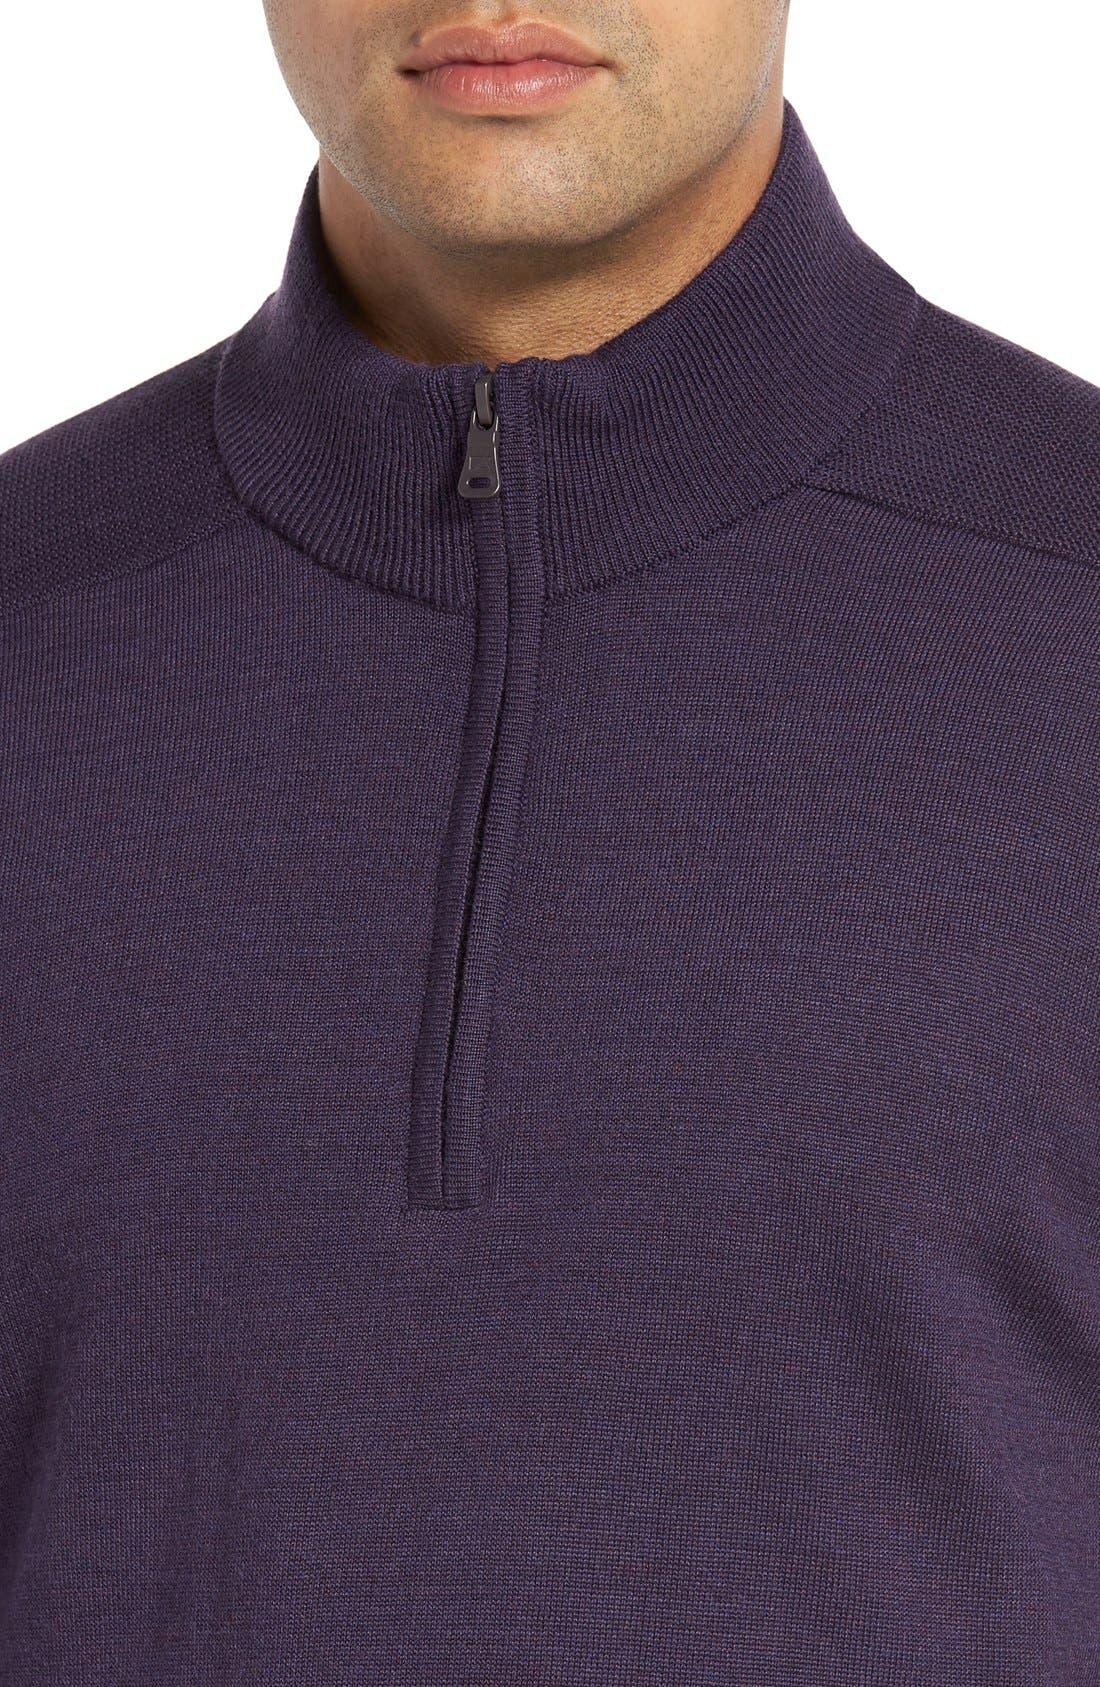 Douglas Quarter Zip Wool Blend Sweater,                             Alternate thumbnail 23, color,